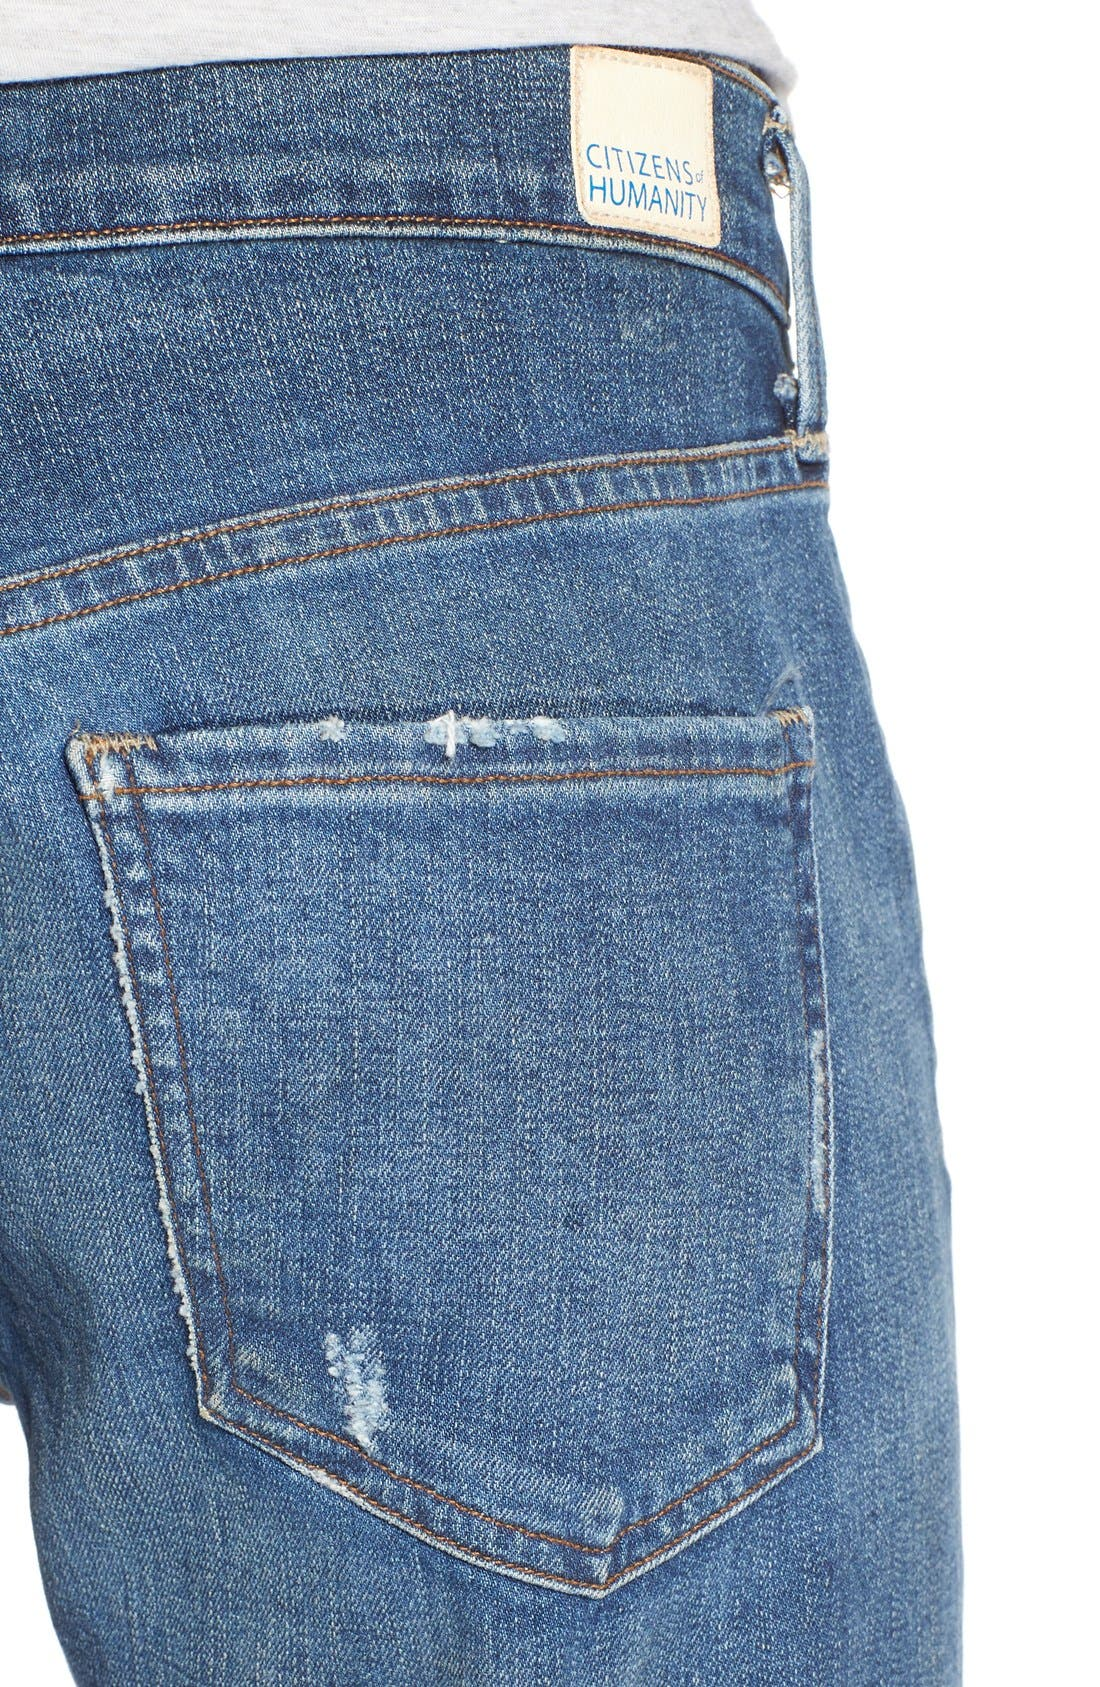 'Emerson Long' Slim Boyfriend Jeans,                             Alternate thumbnail 5, color,                             421